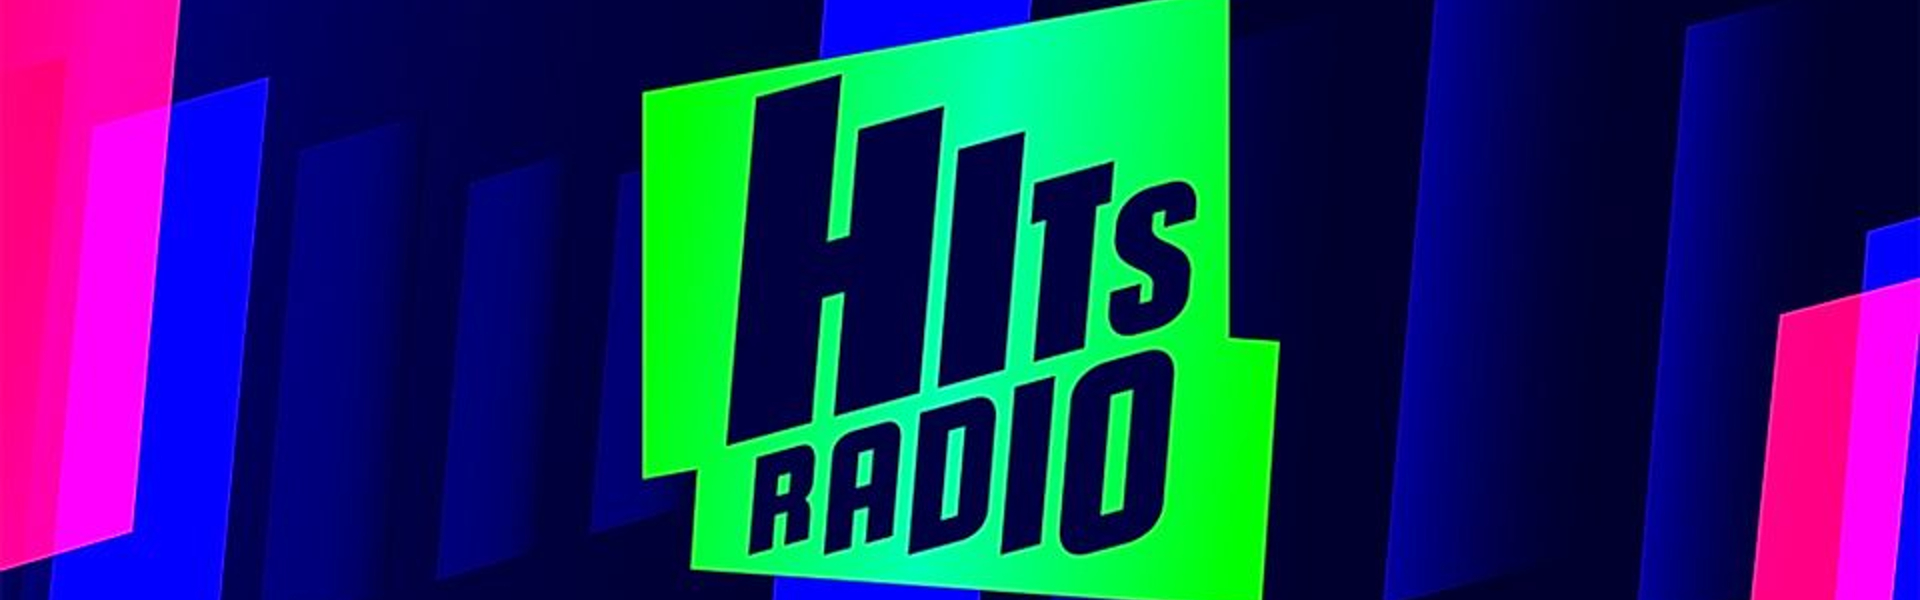 Widget Radio Streaming e Raccolte Hits